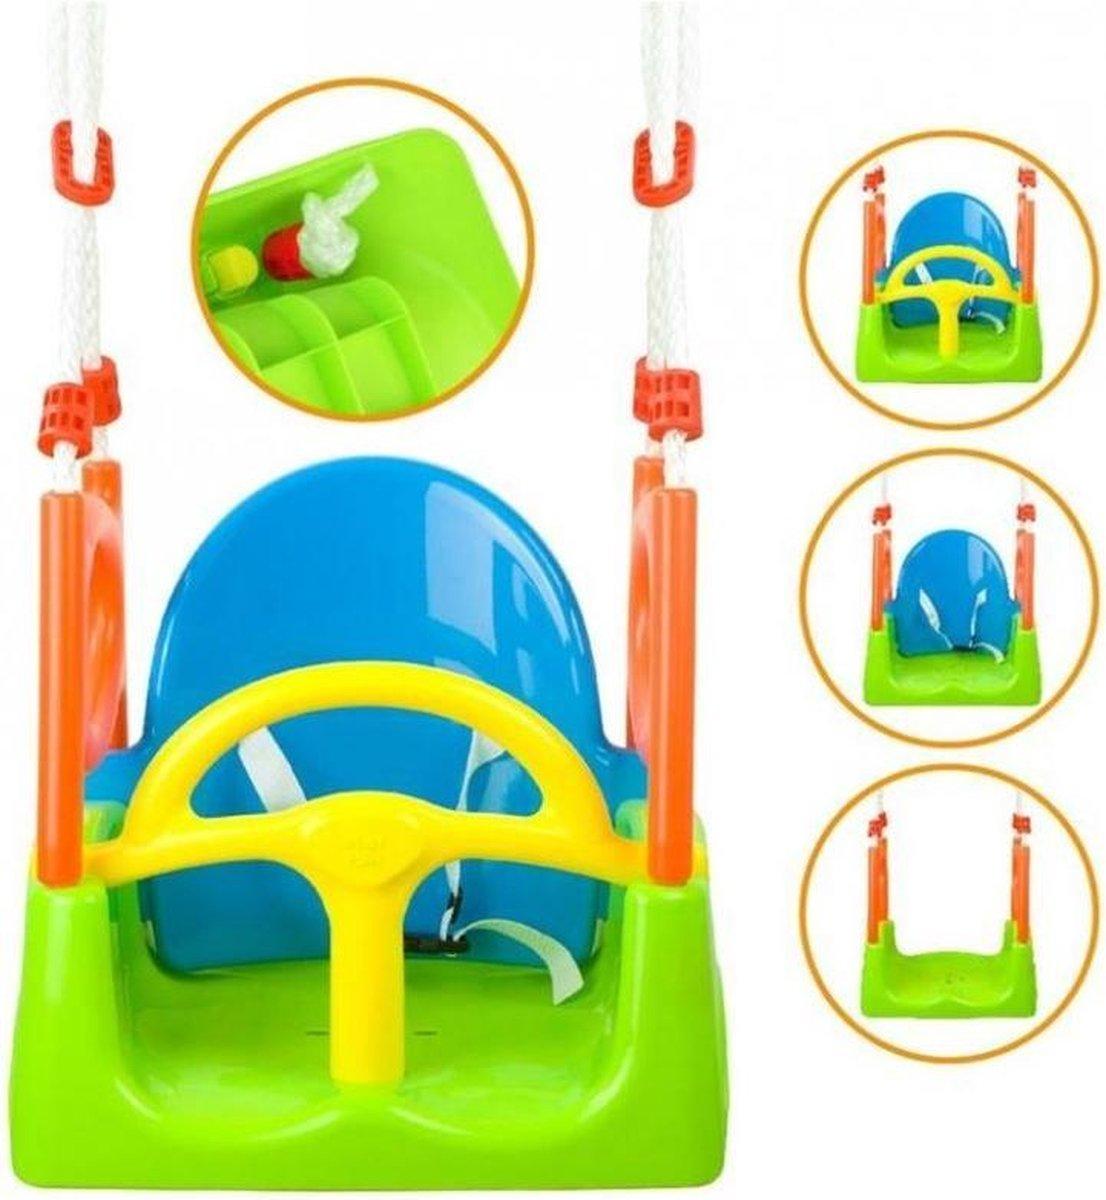 Playfun Schommelzitje 3-in-1 Multicolor 48 X 30 X 160 Cm - Playfun